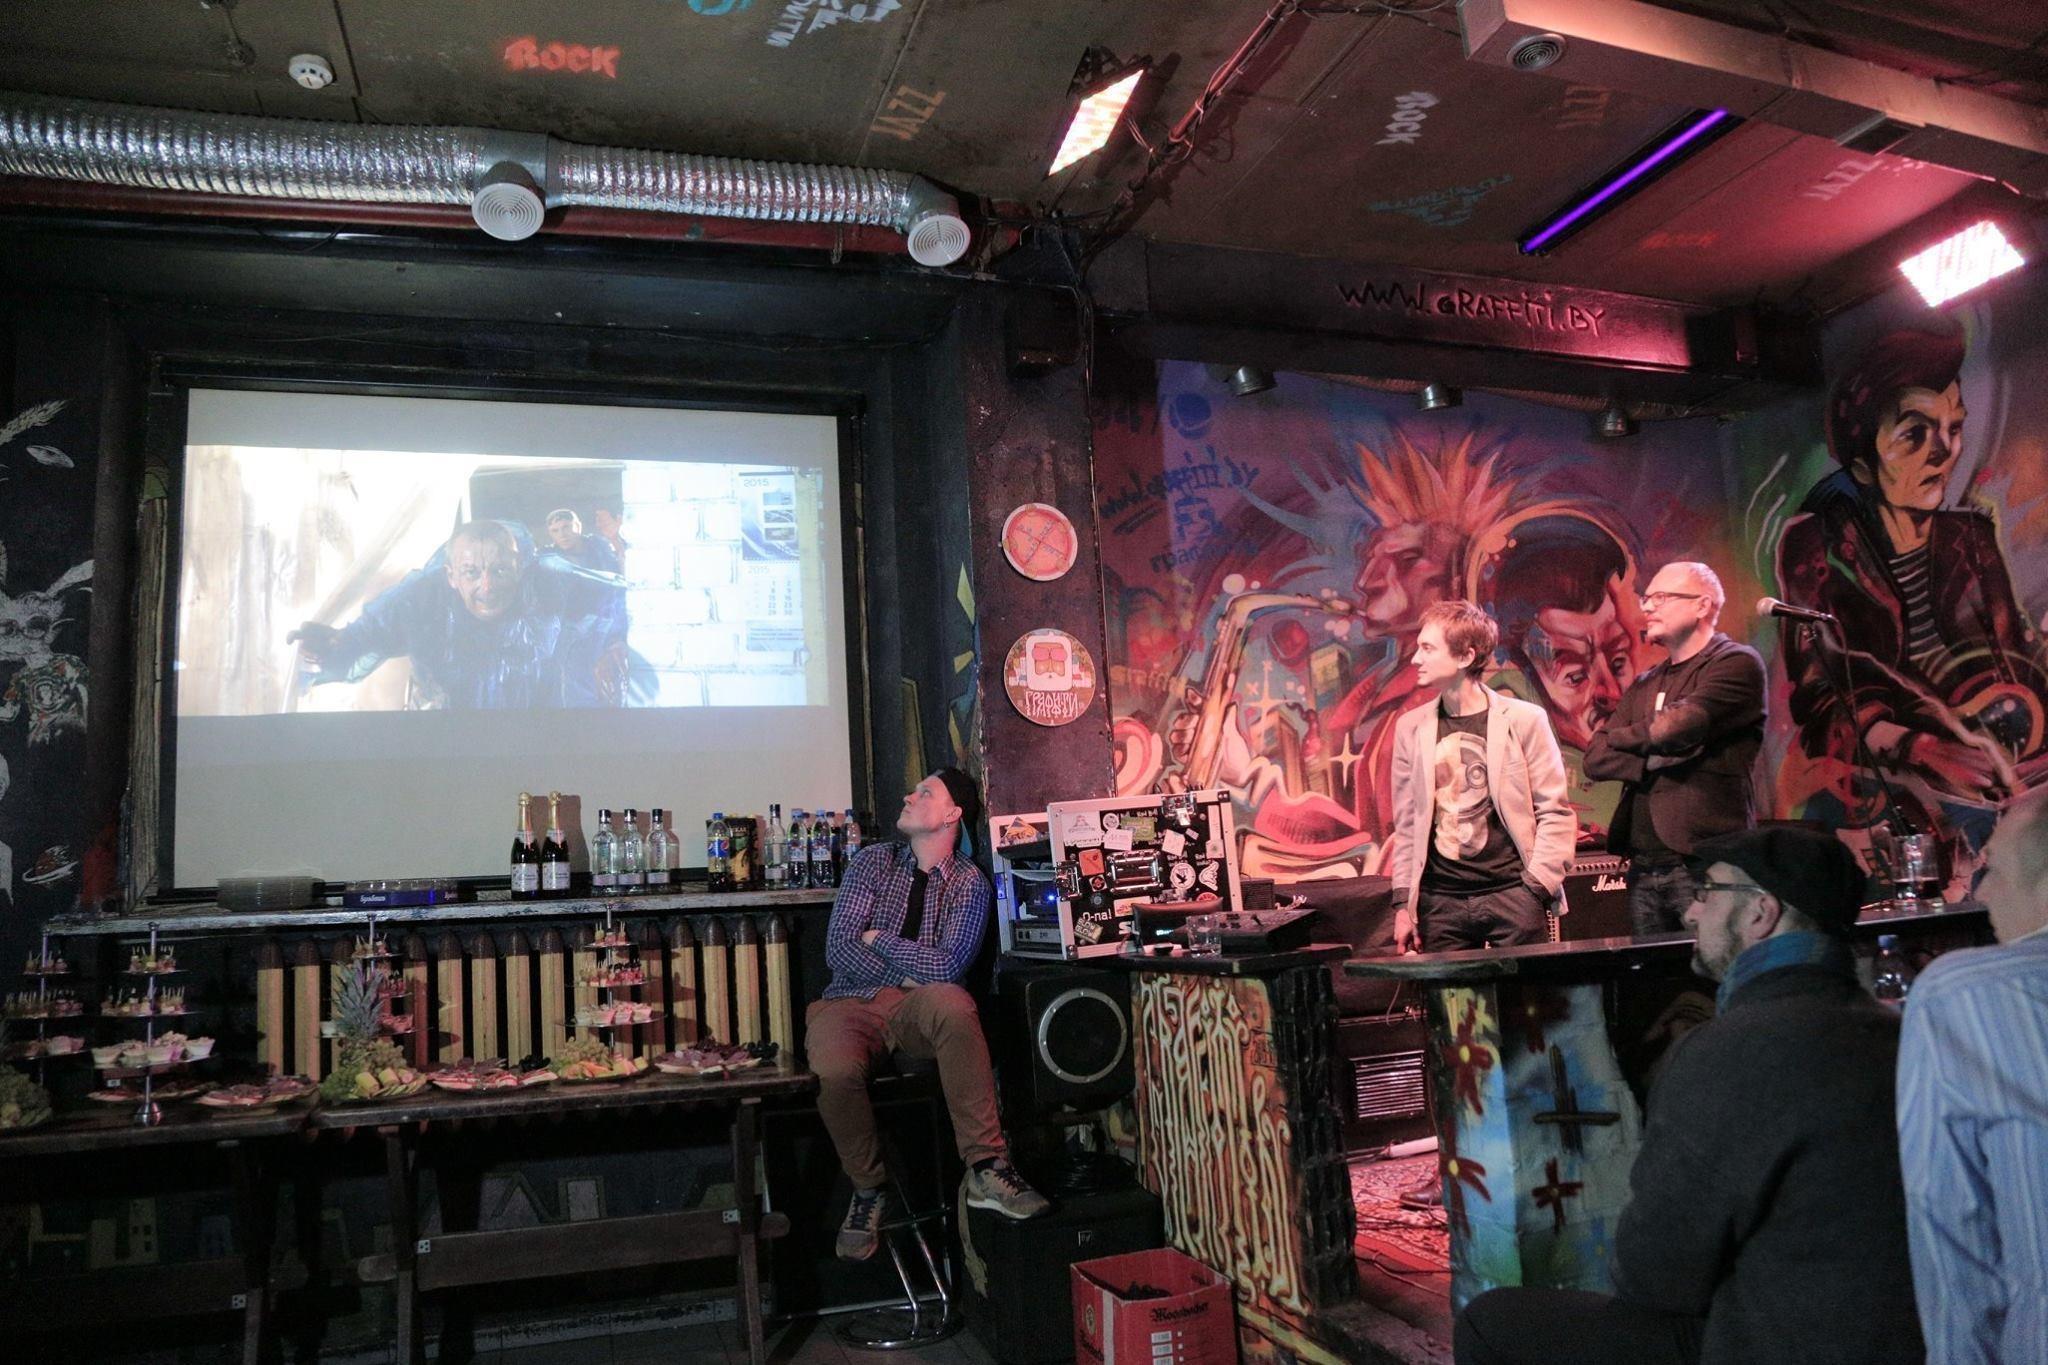 Показ фильма «Гараш» в баре «Граффити». Фото: Алег Грушэцкі